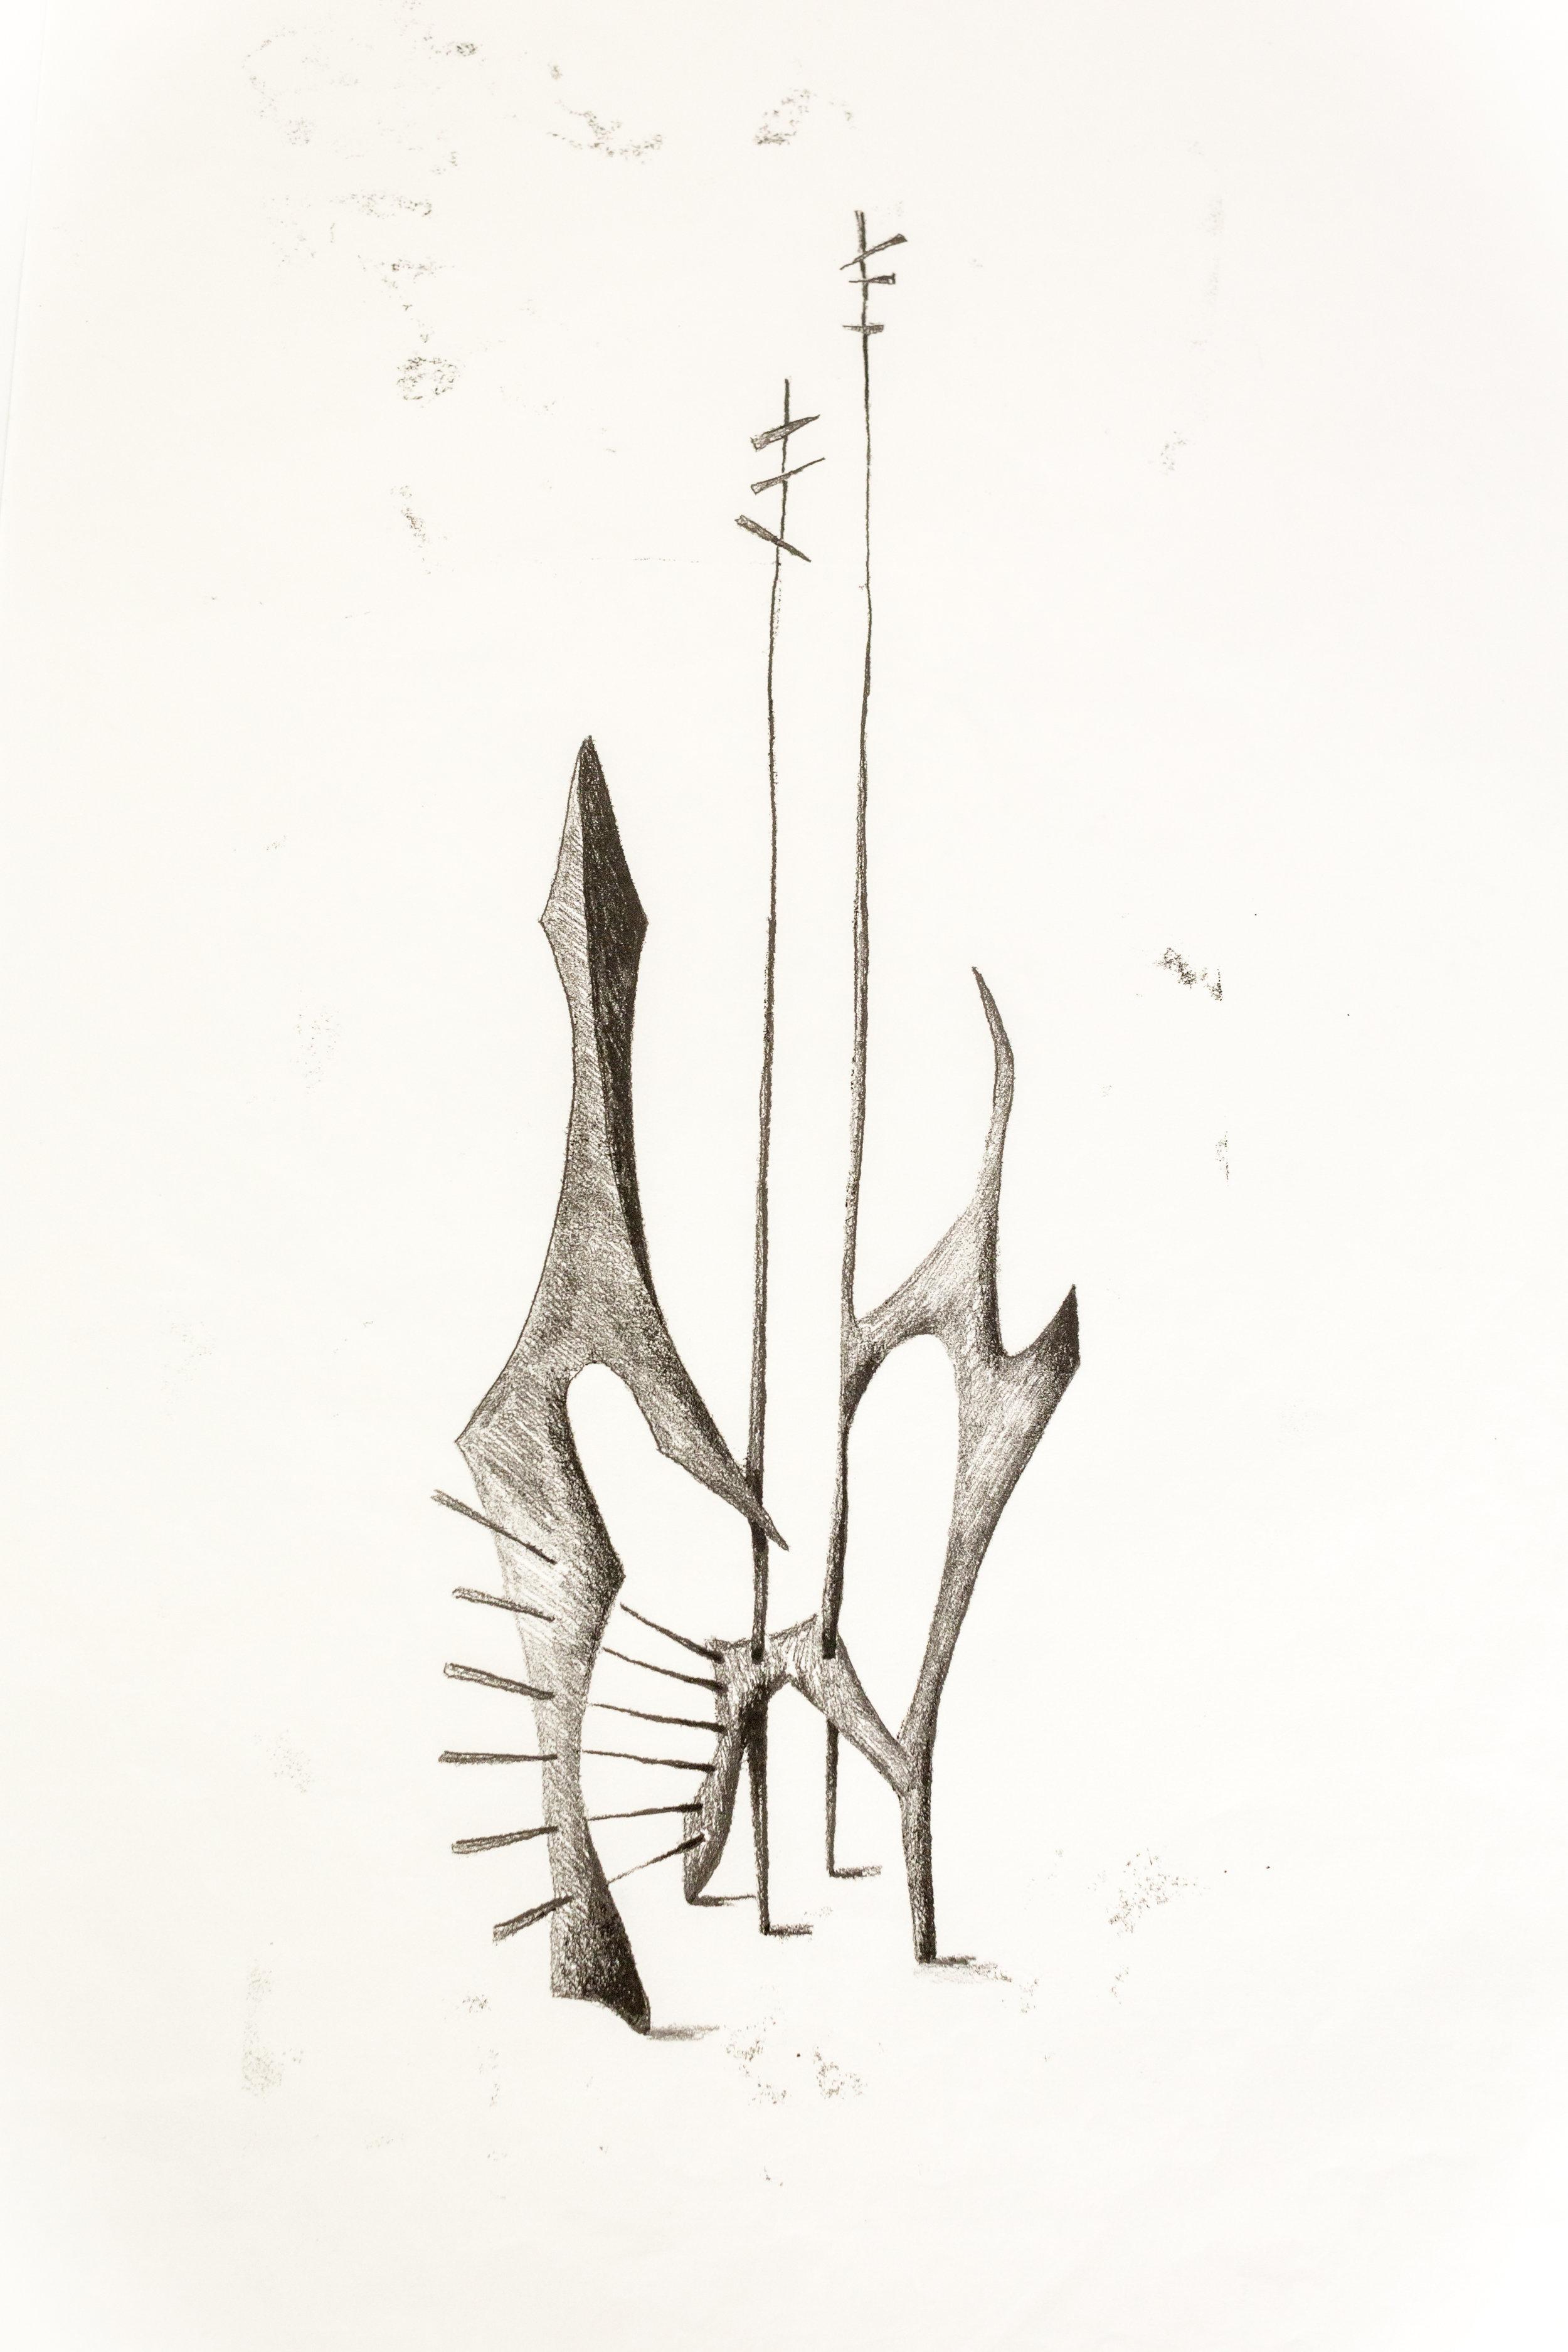 'Untitled Sculpture Drawing v'